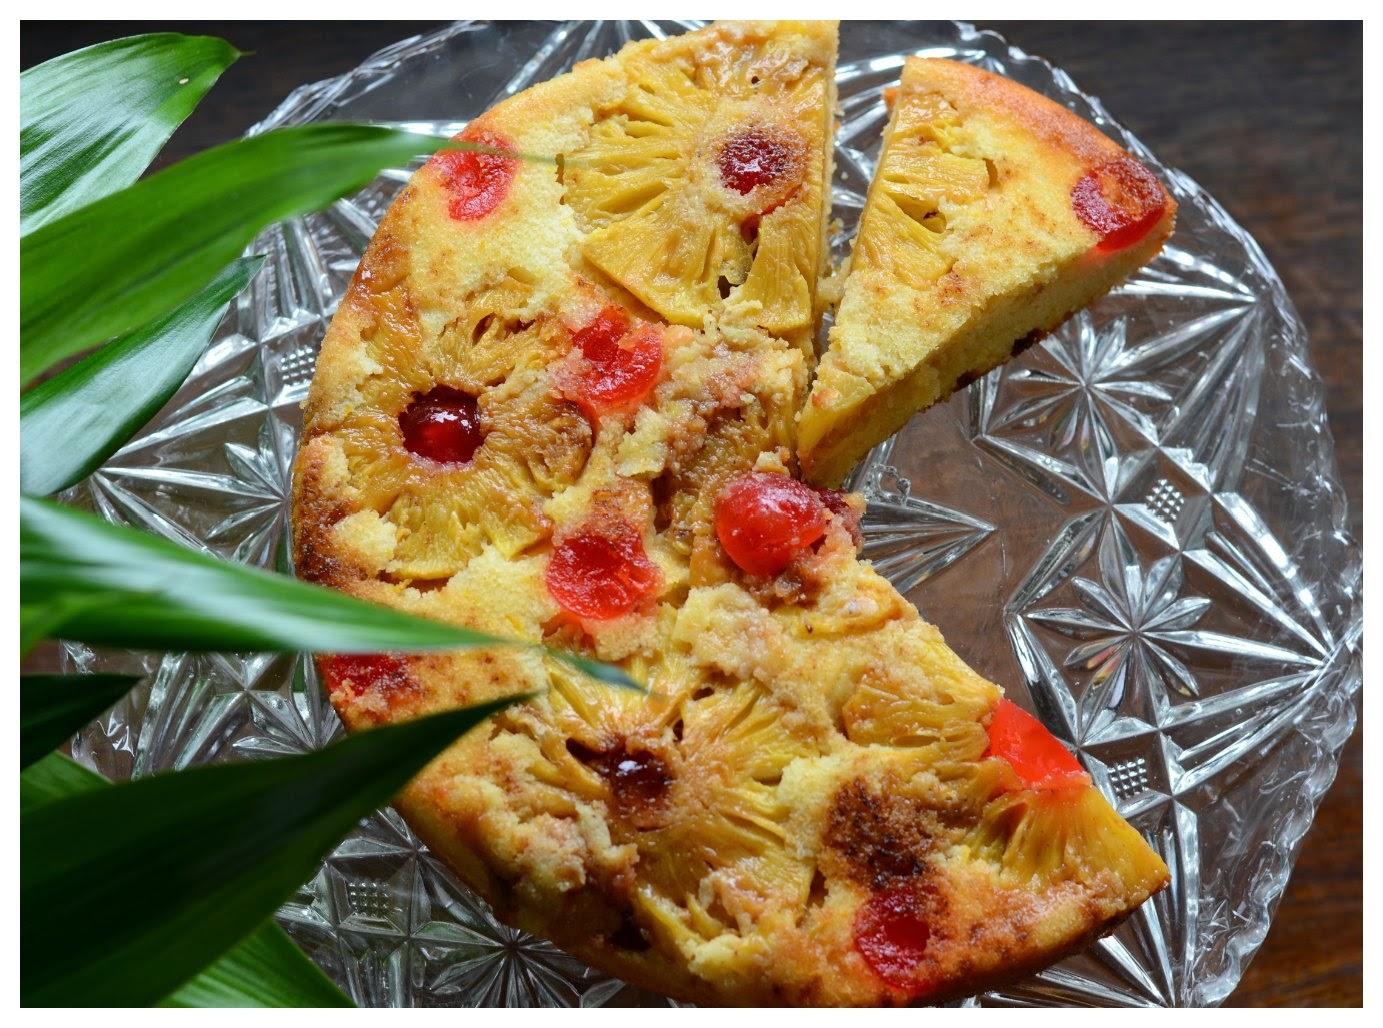 Improve Pineapple Upside Down Cake